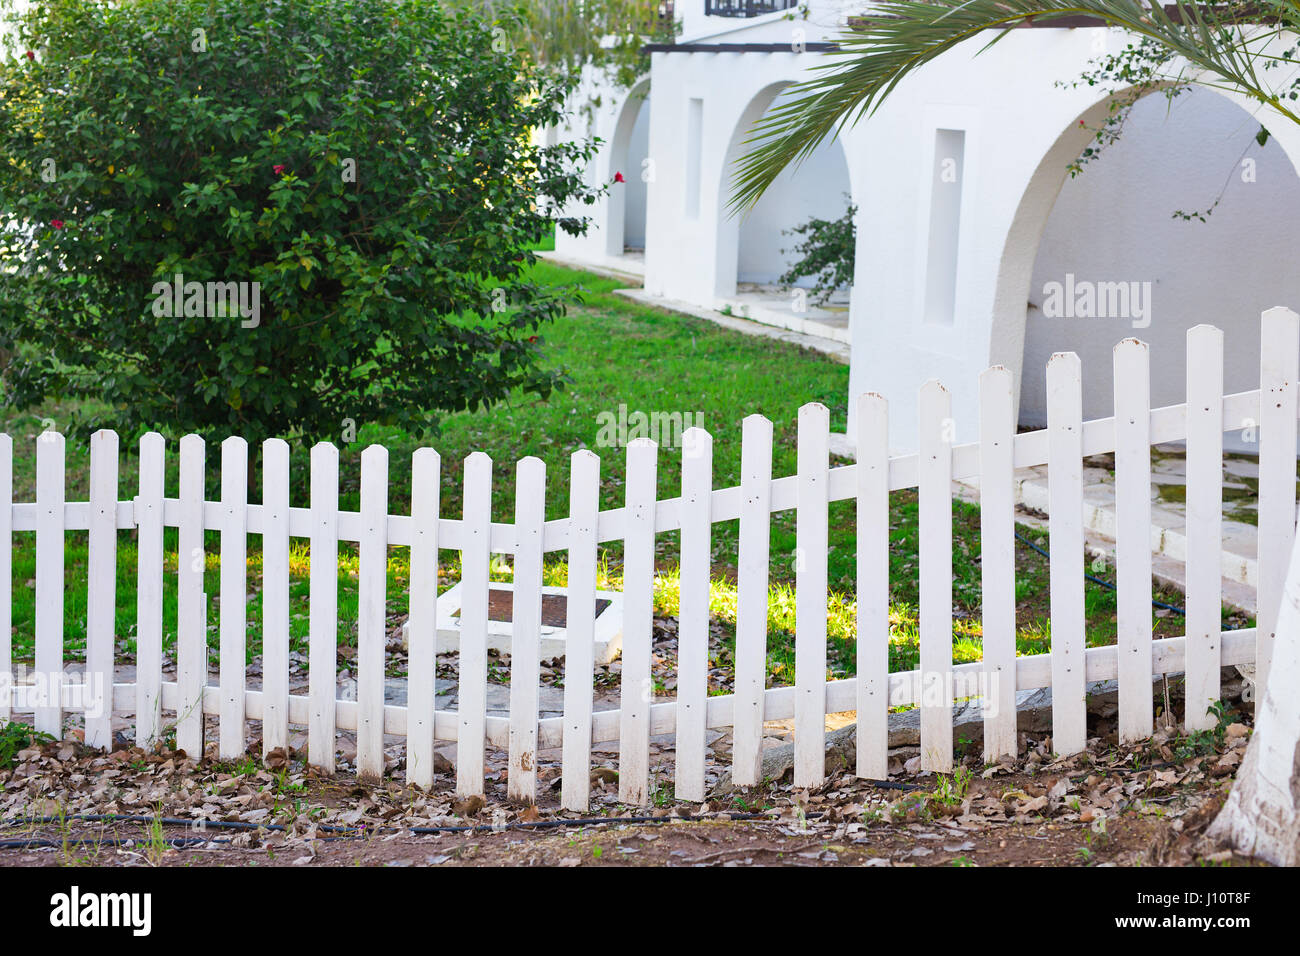 White Picket Garden Gate Stockfotos & White Picket Garden Gate